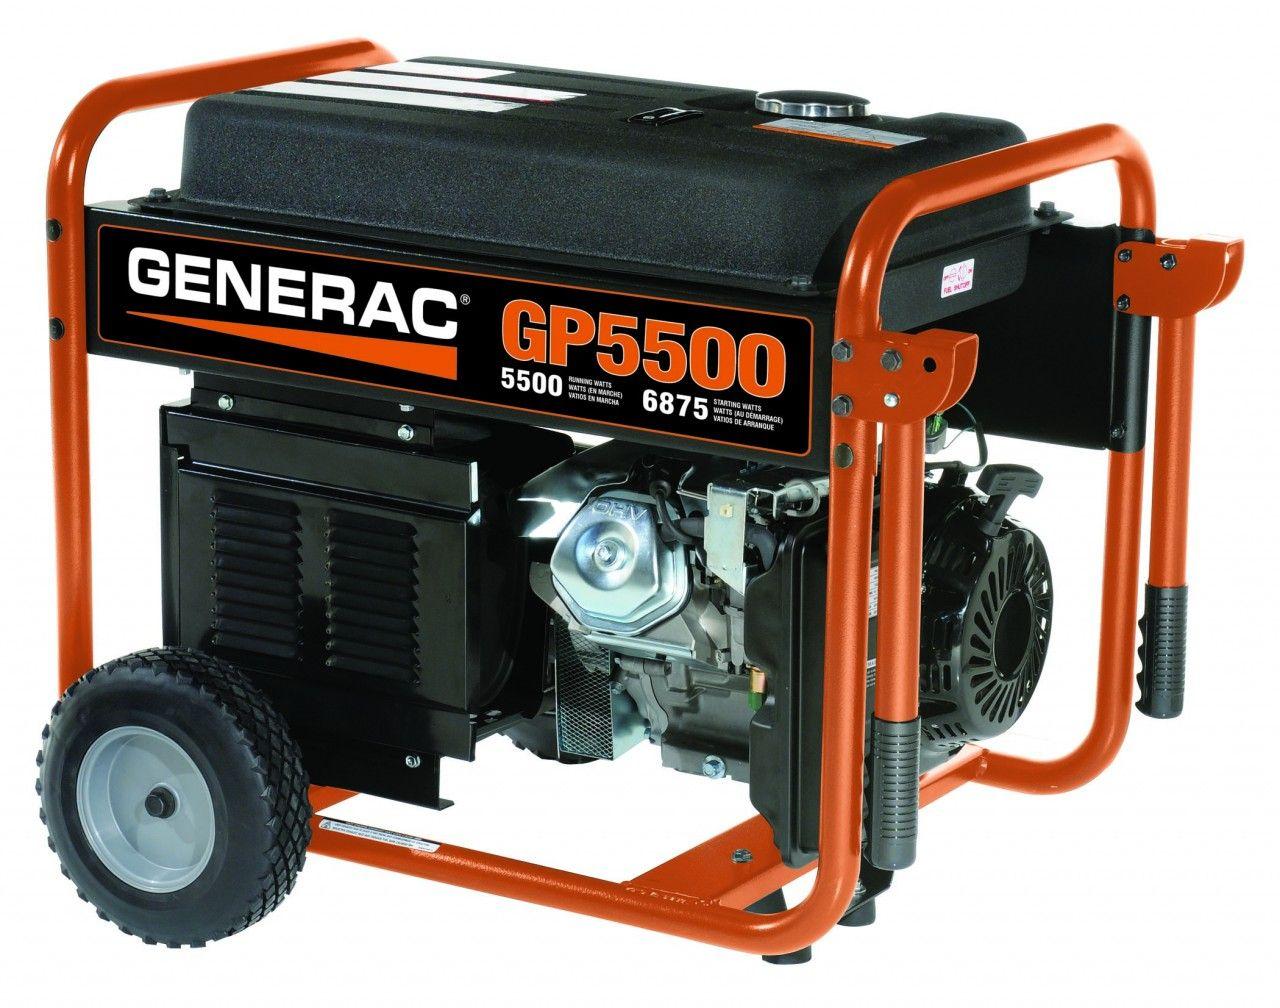 Generac Generator Info On Generac Generators Best Portable Generator Portable Generators Power Generator